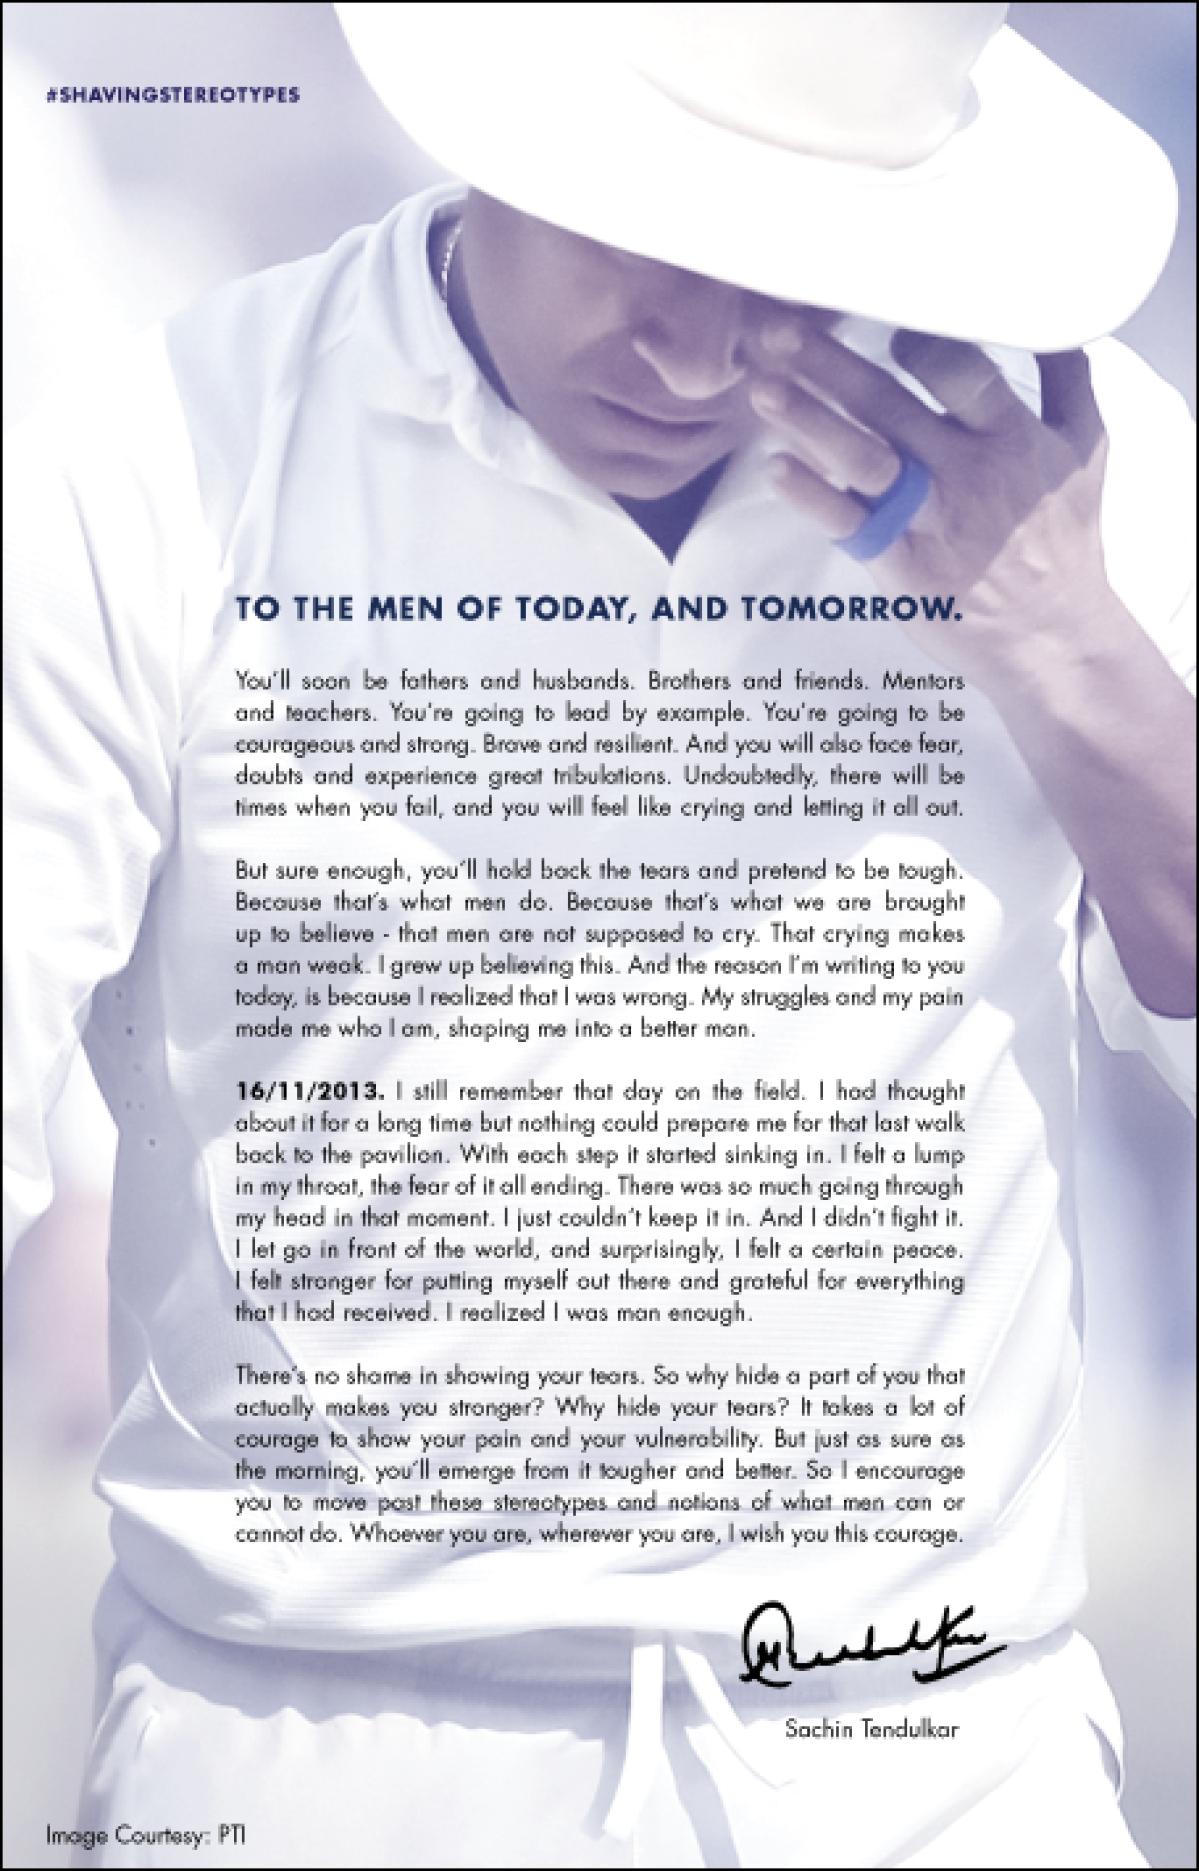 Sachin Tendulkar's open letter to young boys and men.